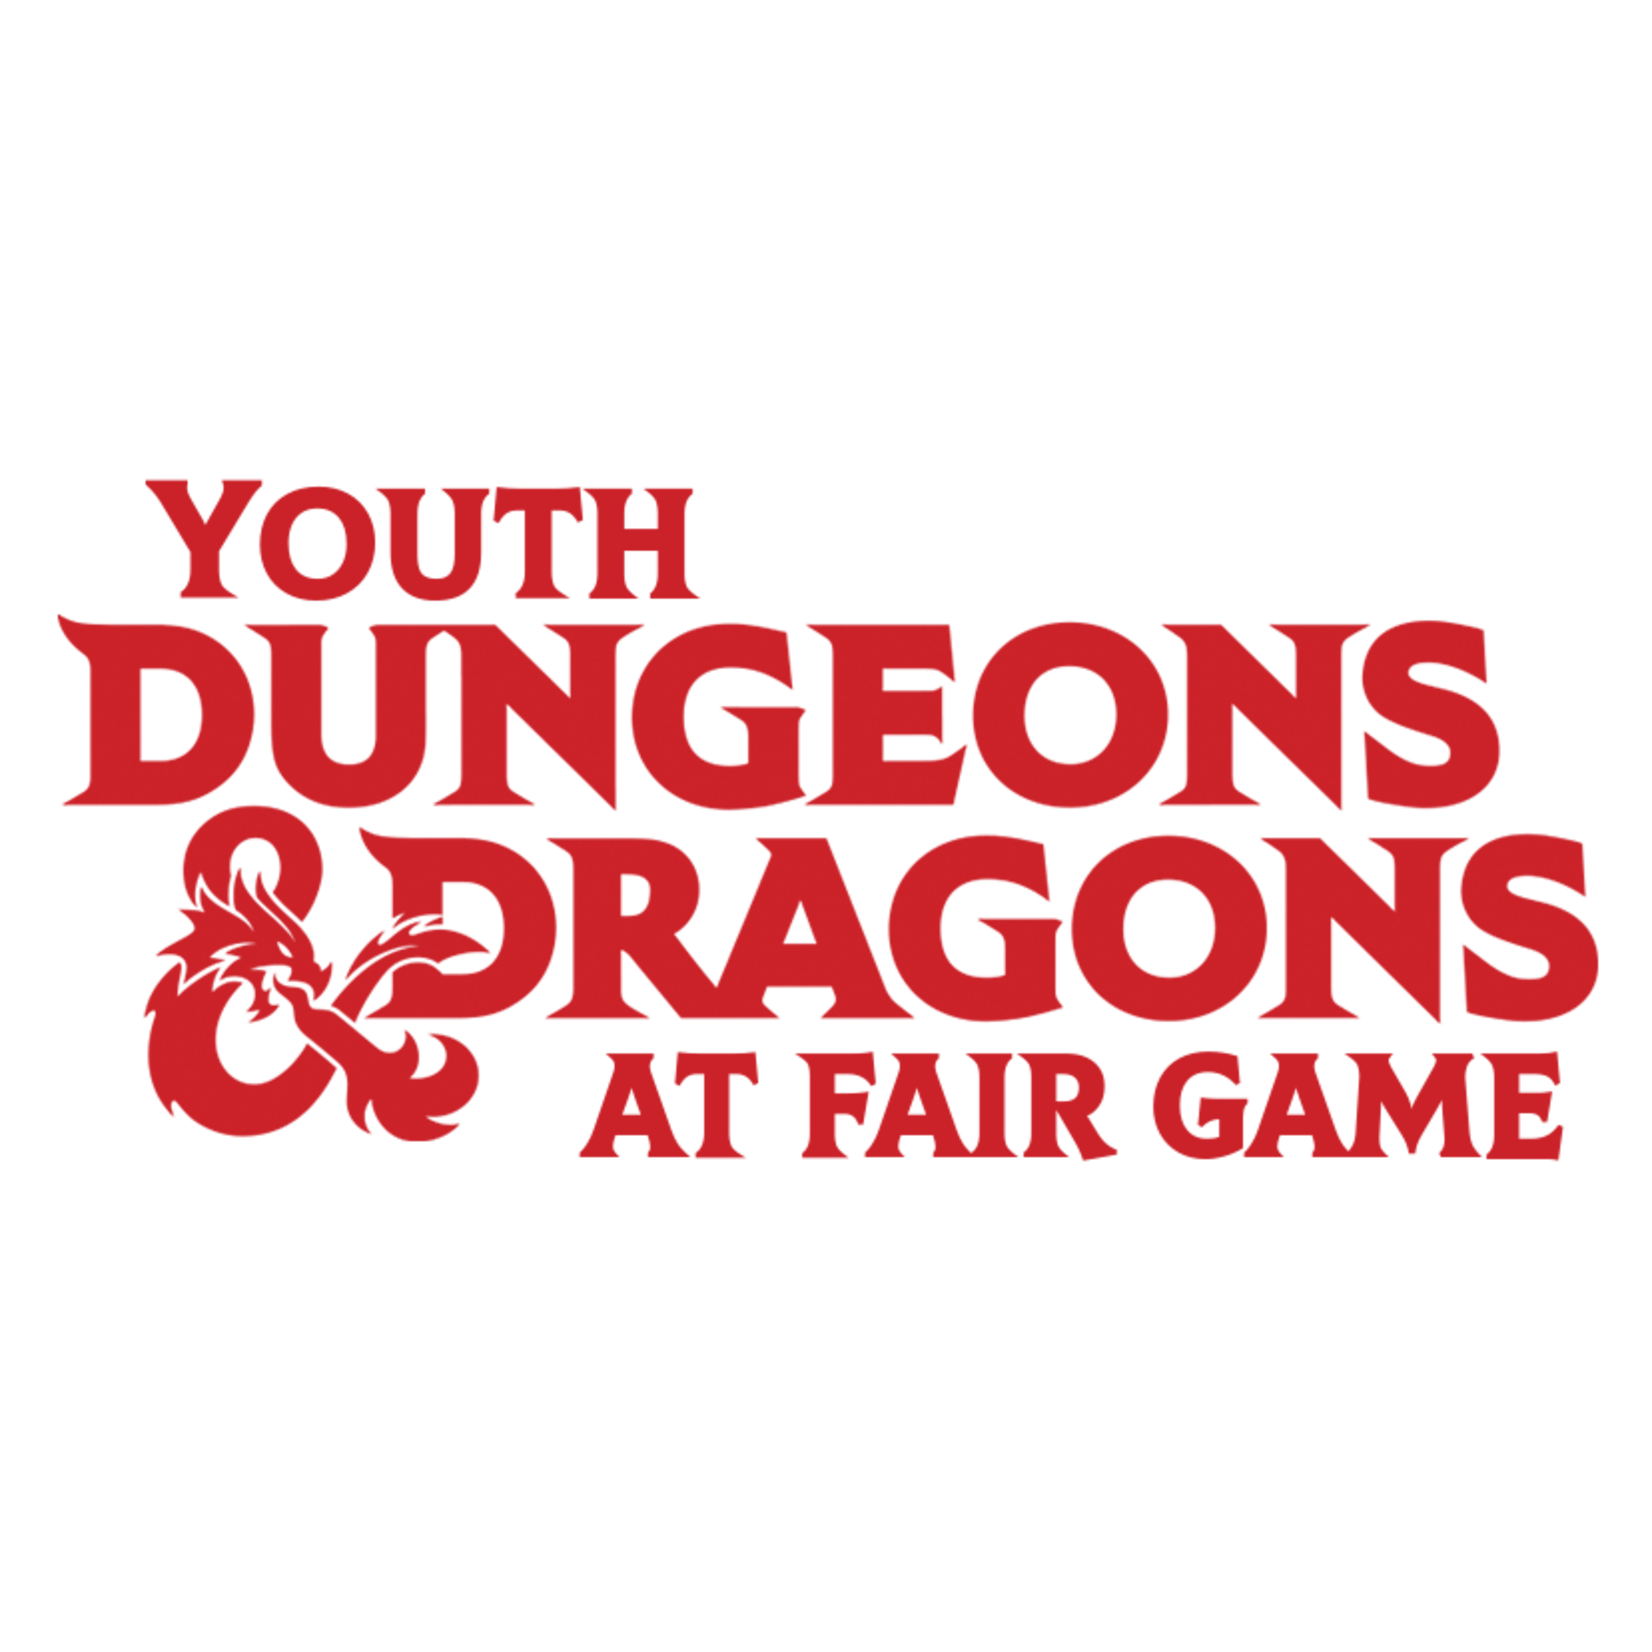 Fair Game YDND Summer 2021 - Group Z2 - Mon 5:30-7:30 PM CST